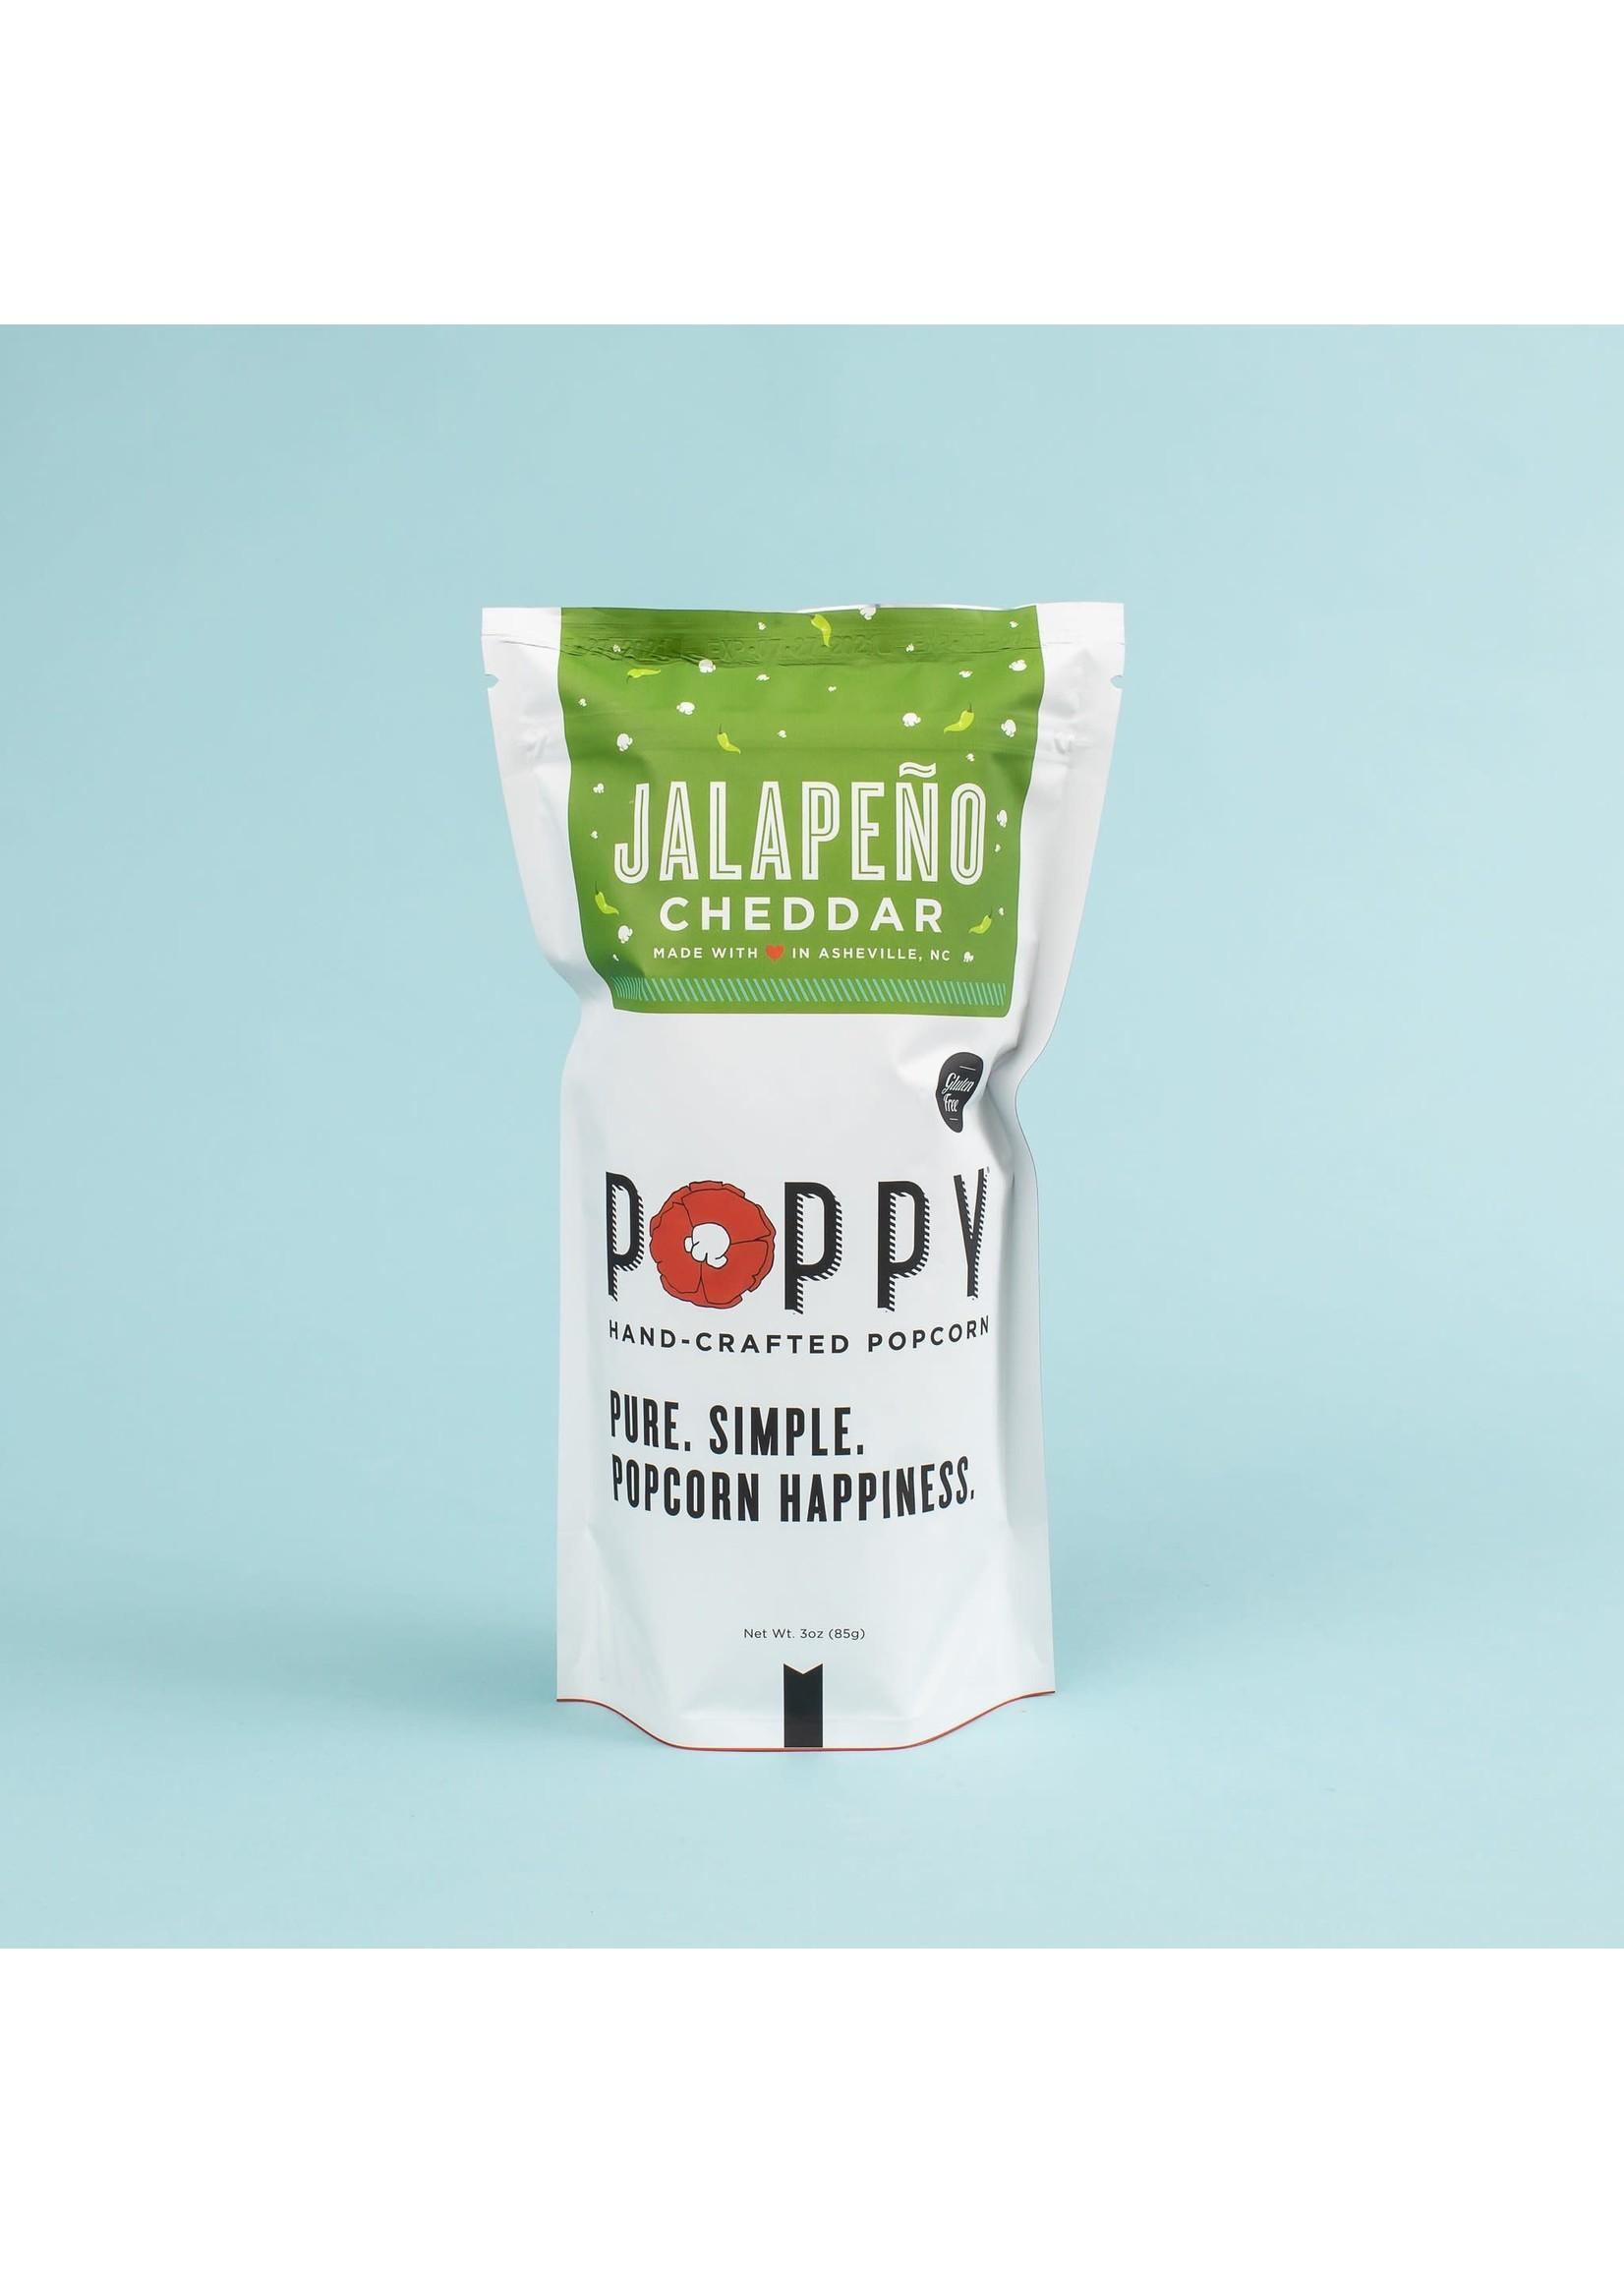 Poppy Handcrafted Popcorn Jalapeno Cheddar Popcorn